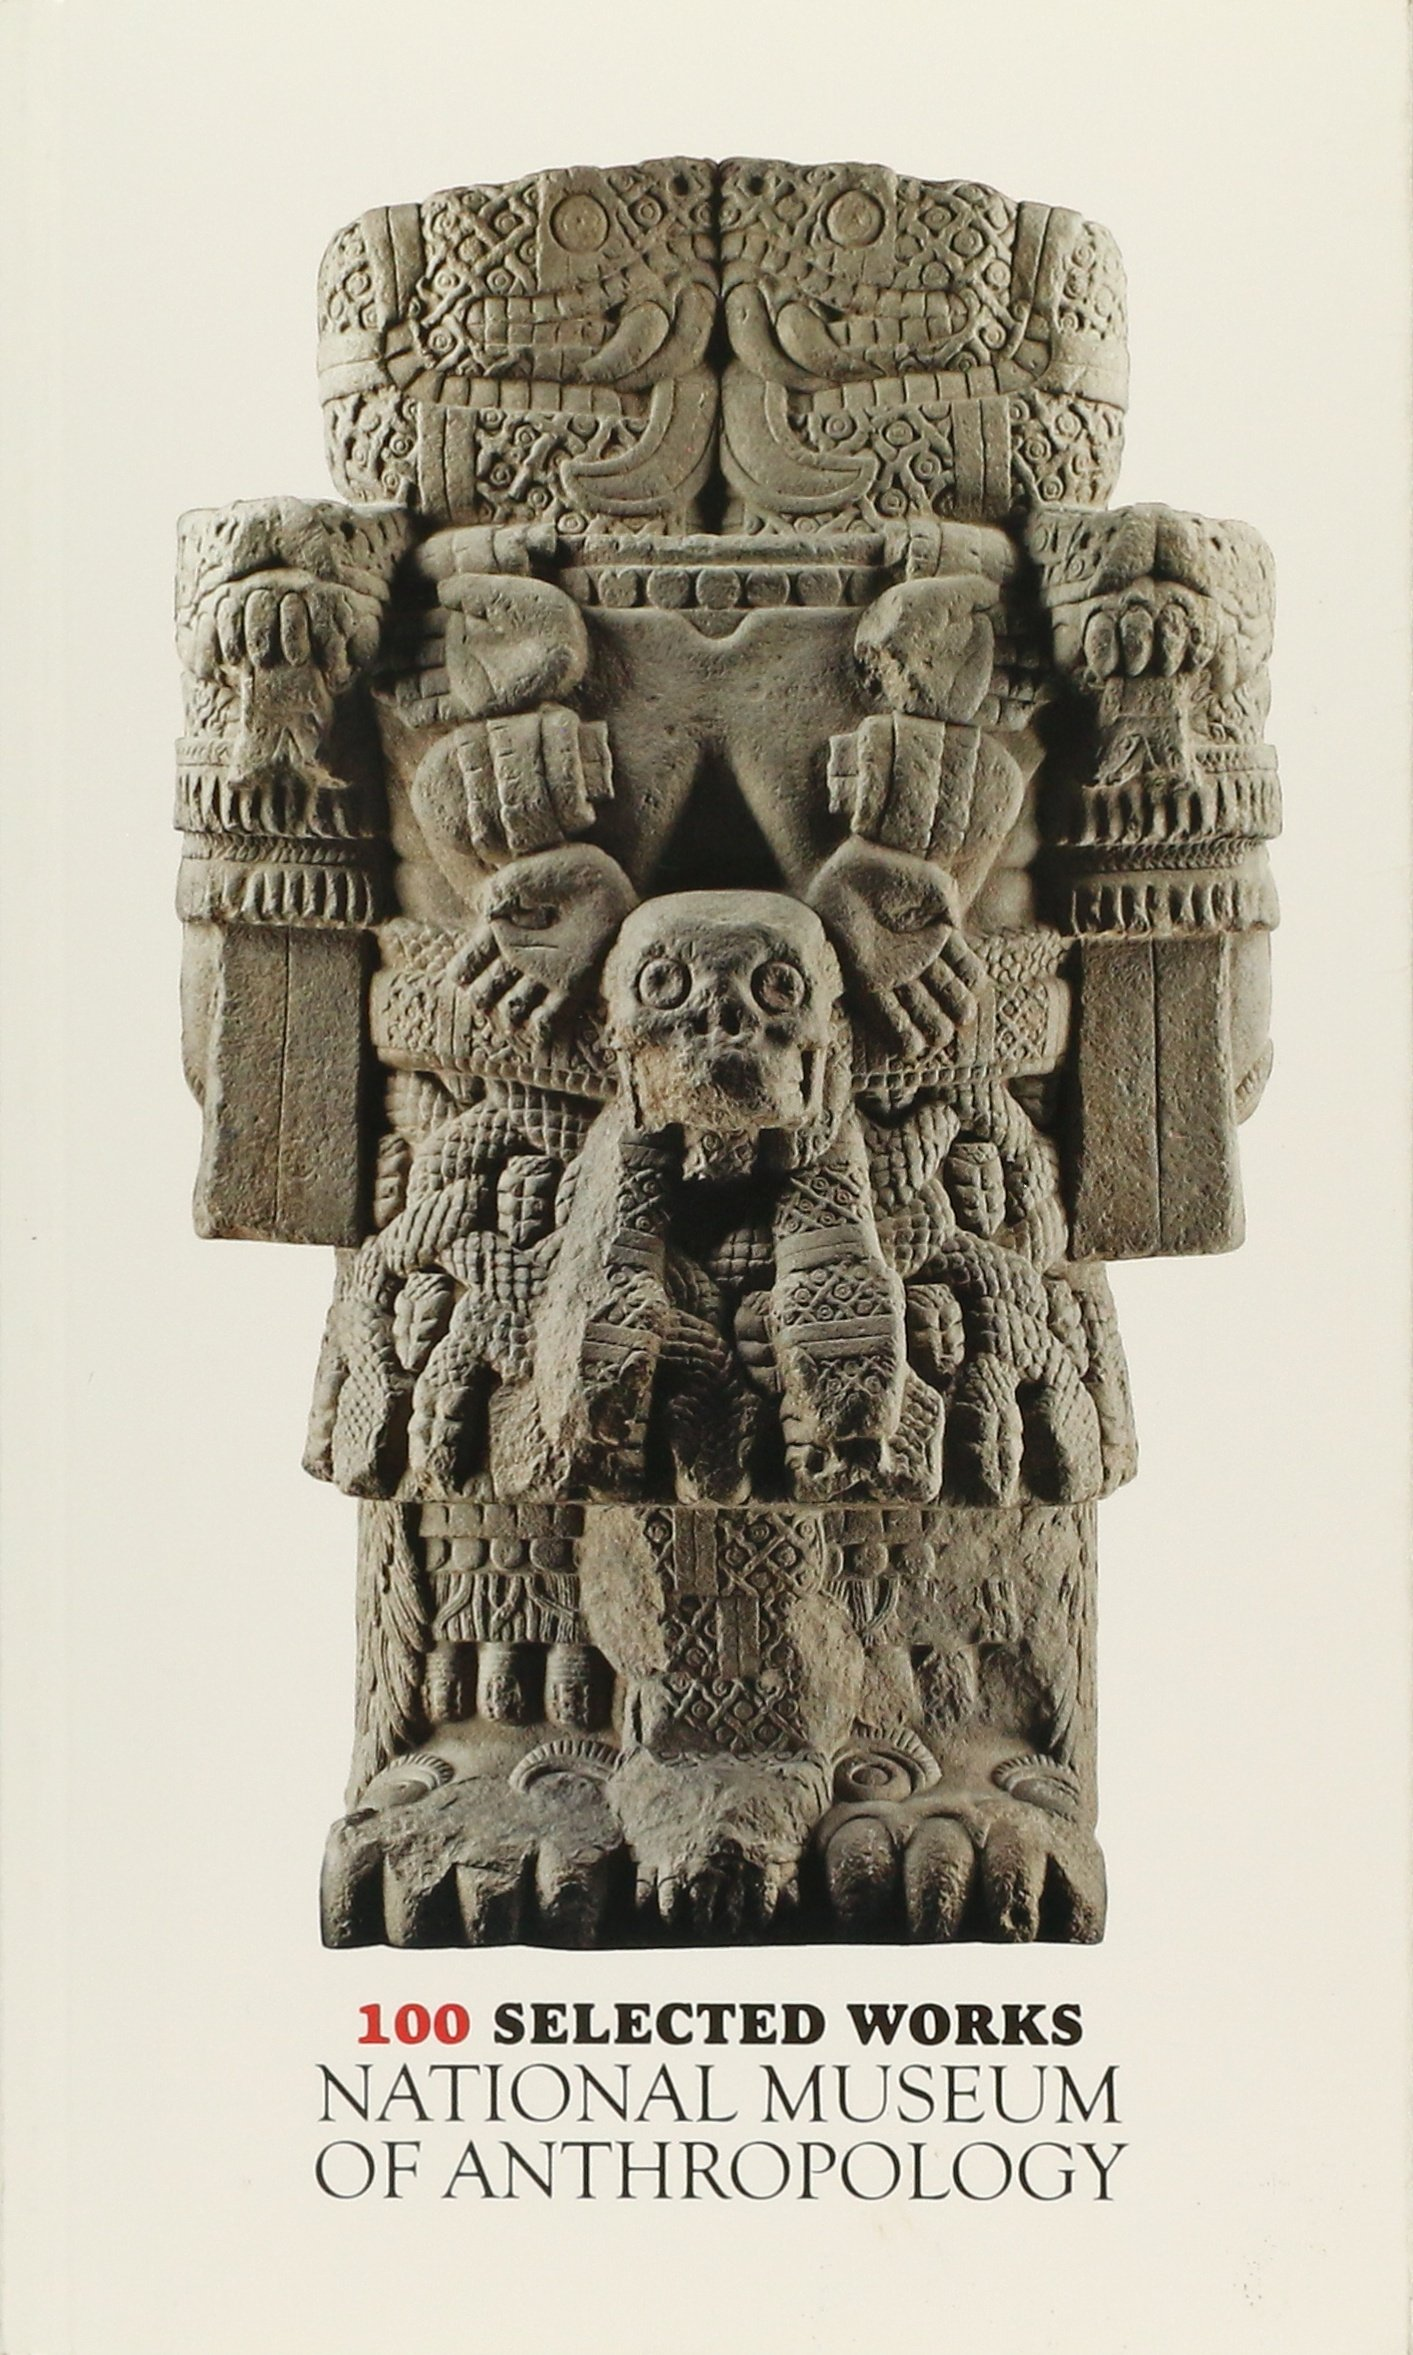 Download Catalogo Escencial Del Museo Nacional De Antropologia / Essential Catalogue of the National Museum of Anthropology: 101 Obras / 100 Works PDF